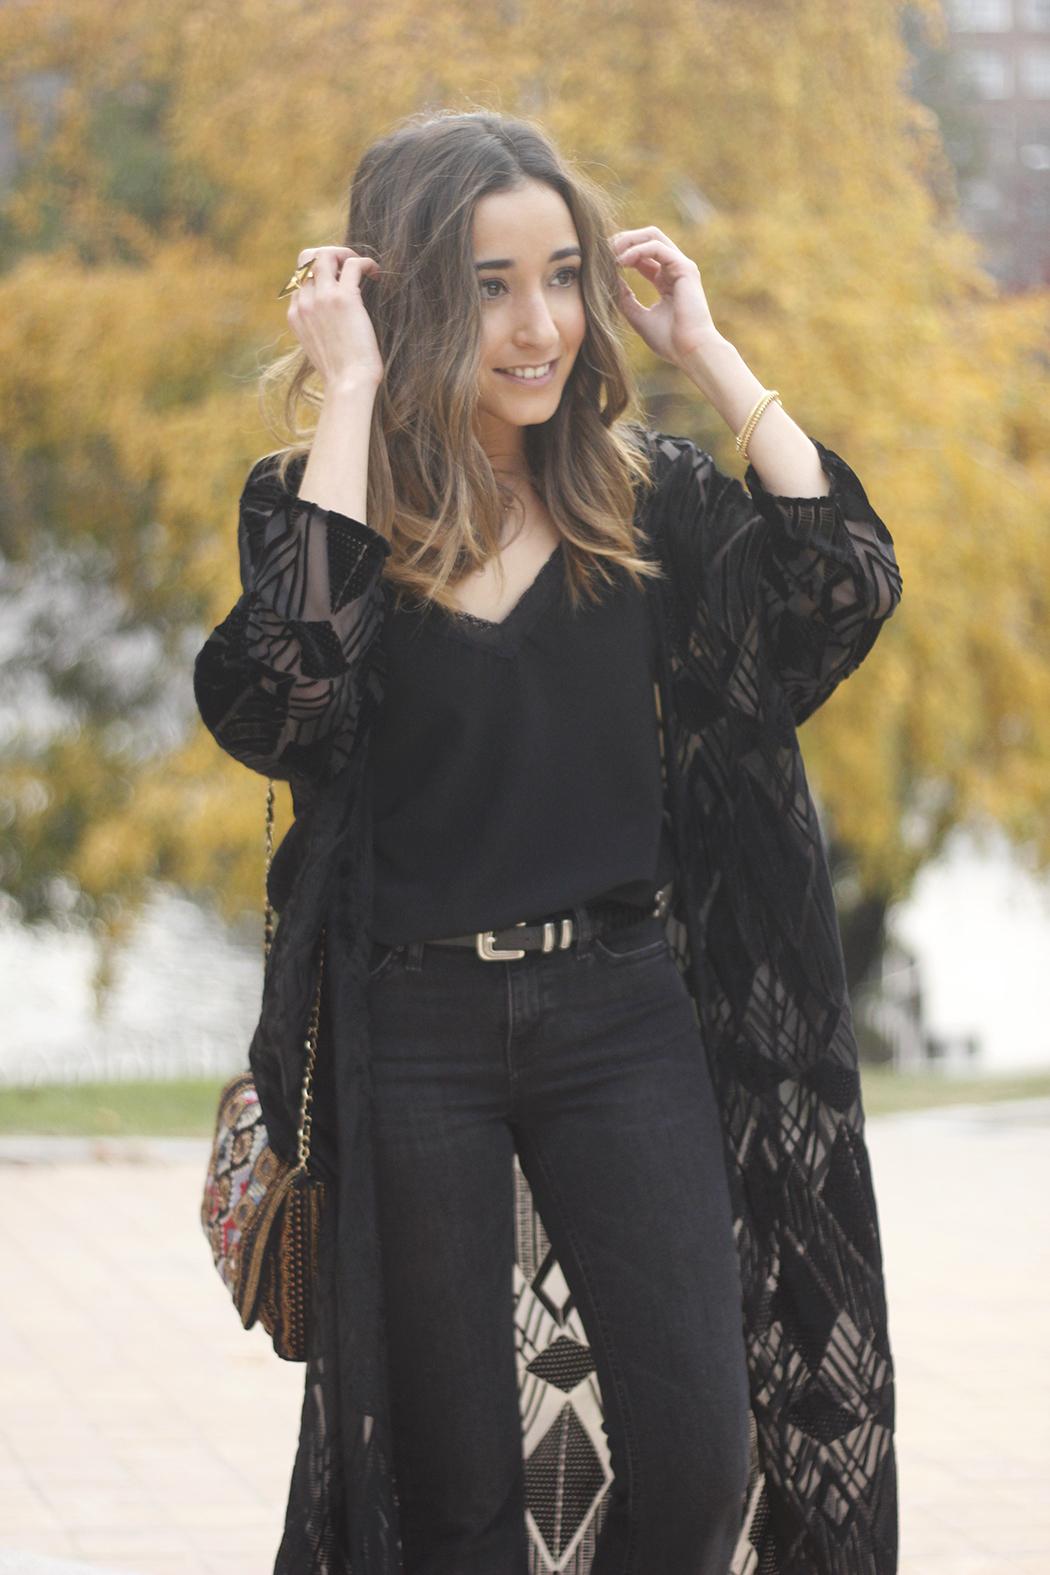 Black Kimono Black flared jeans outfit22